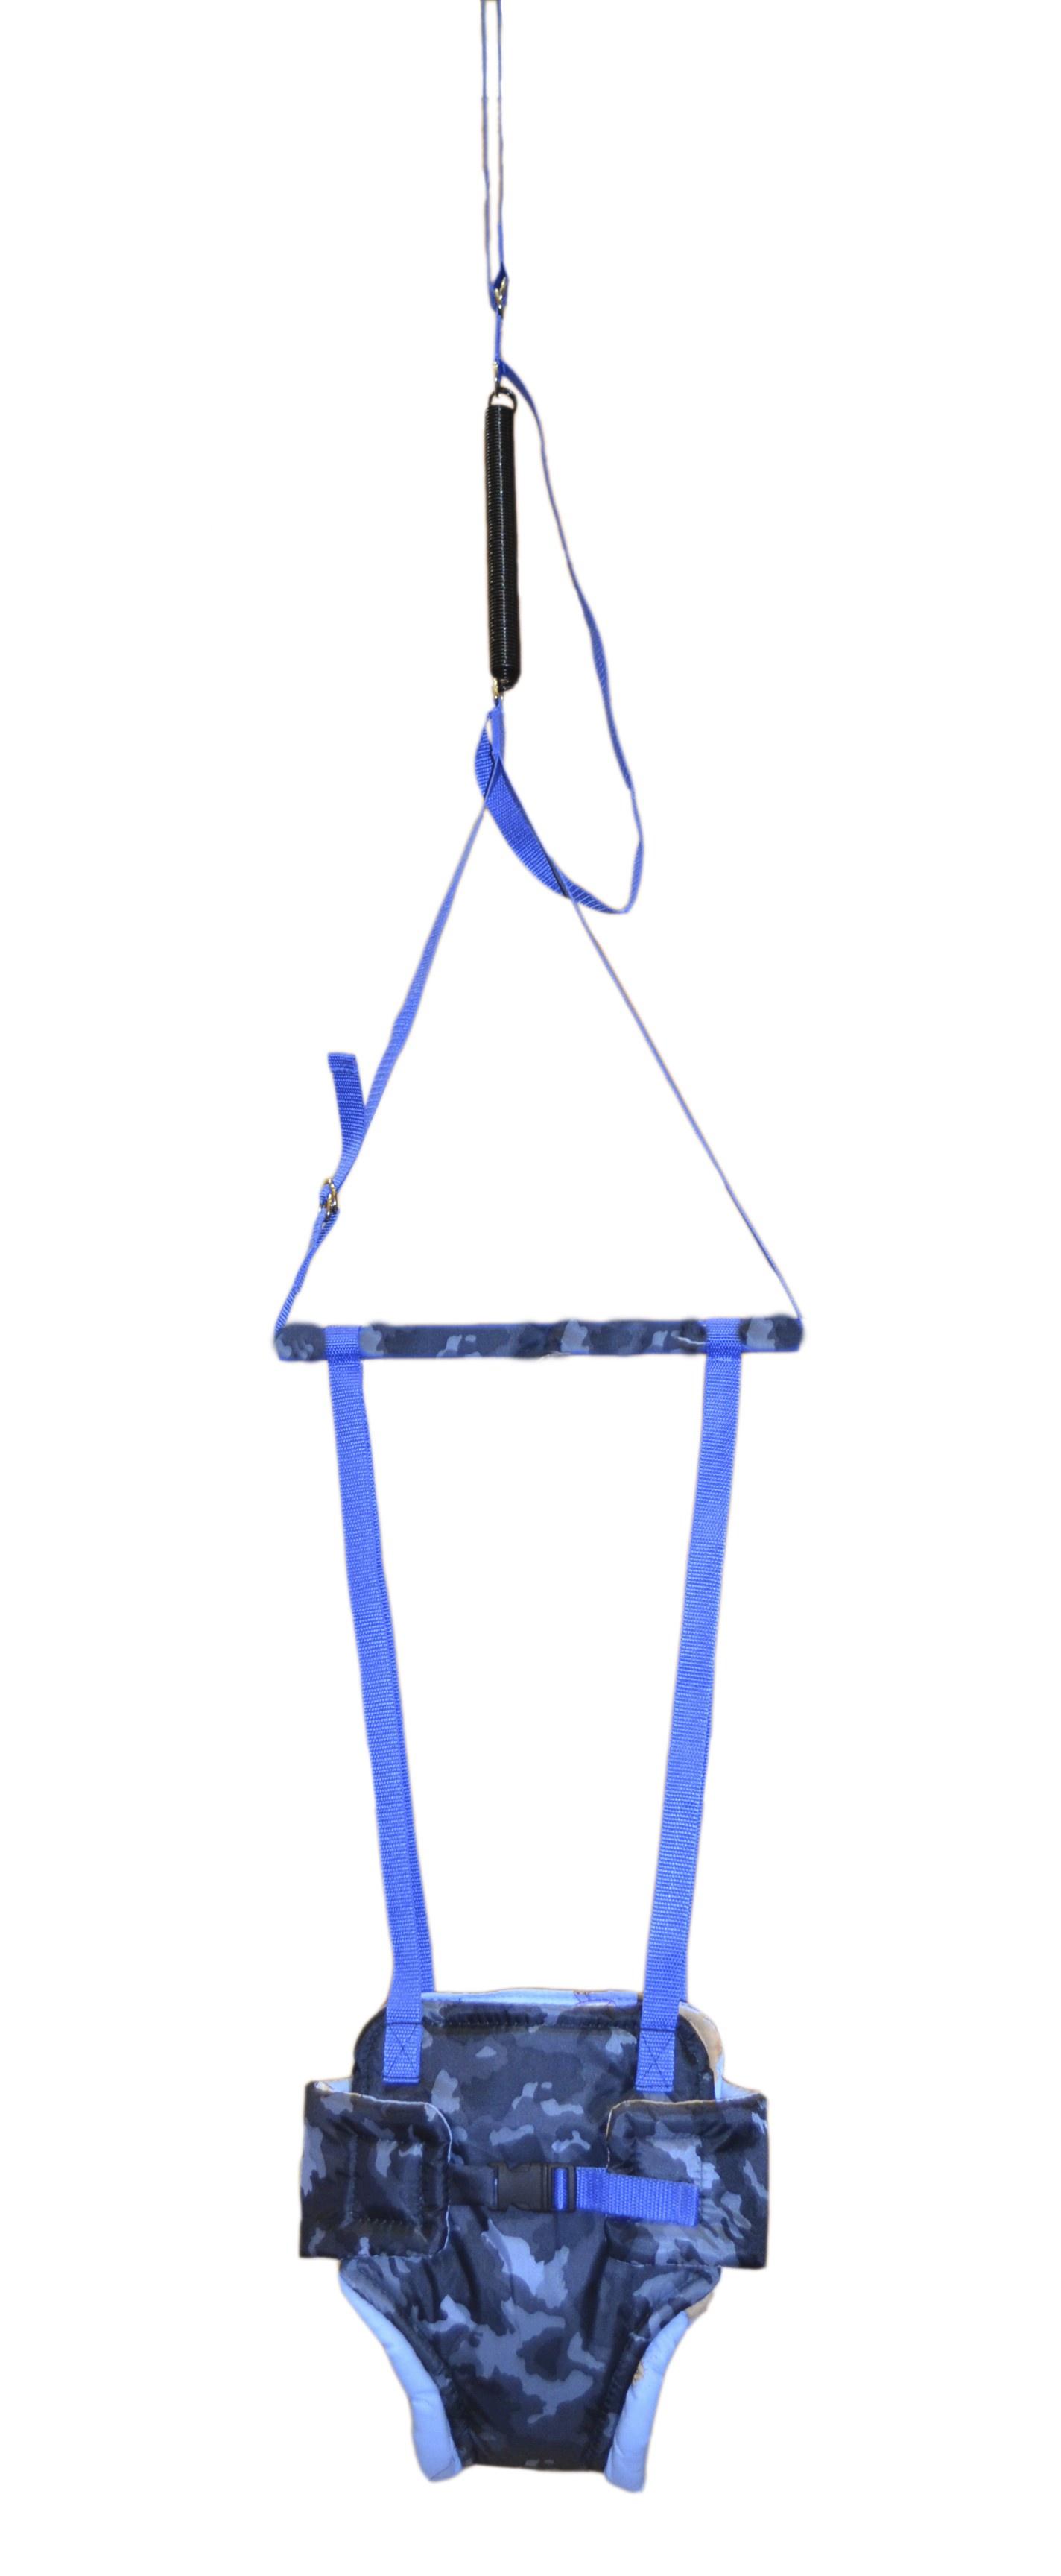 Детский тренажер Мирти Прыгунки №1, 4610003450762, синий